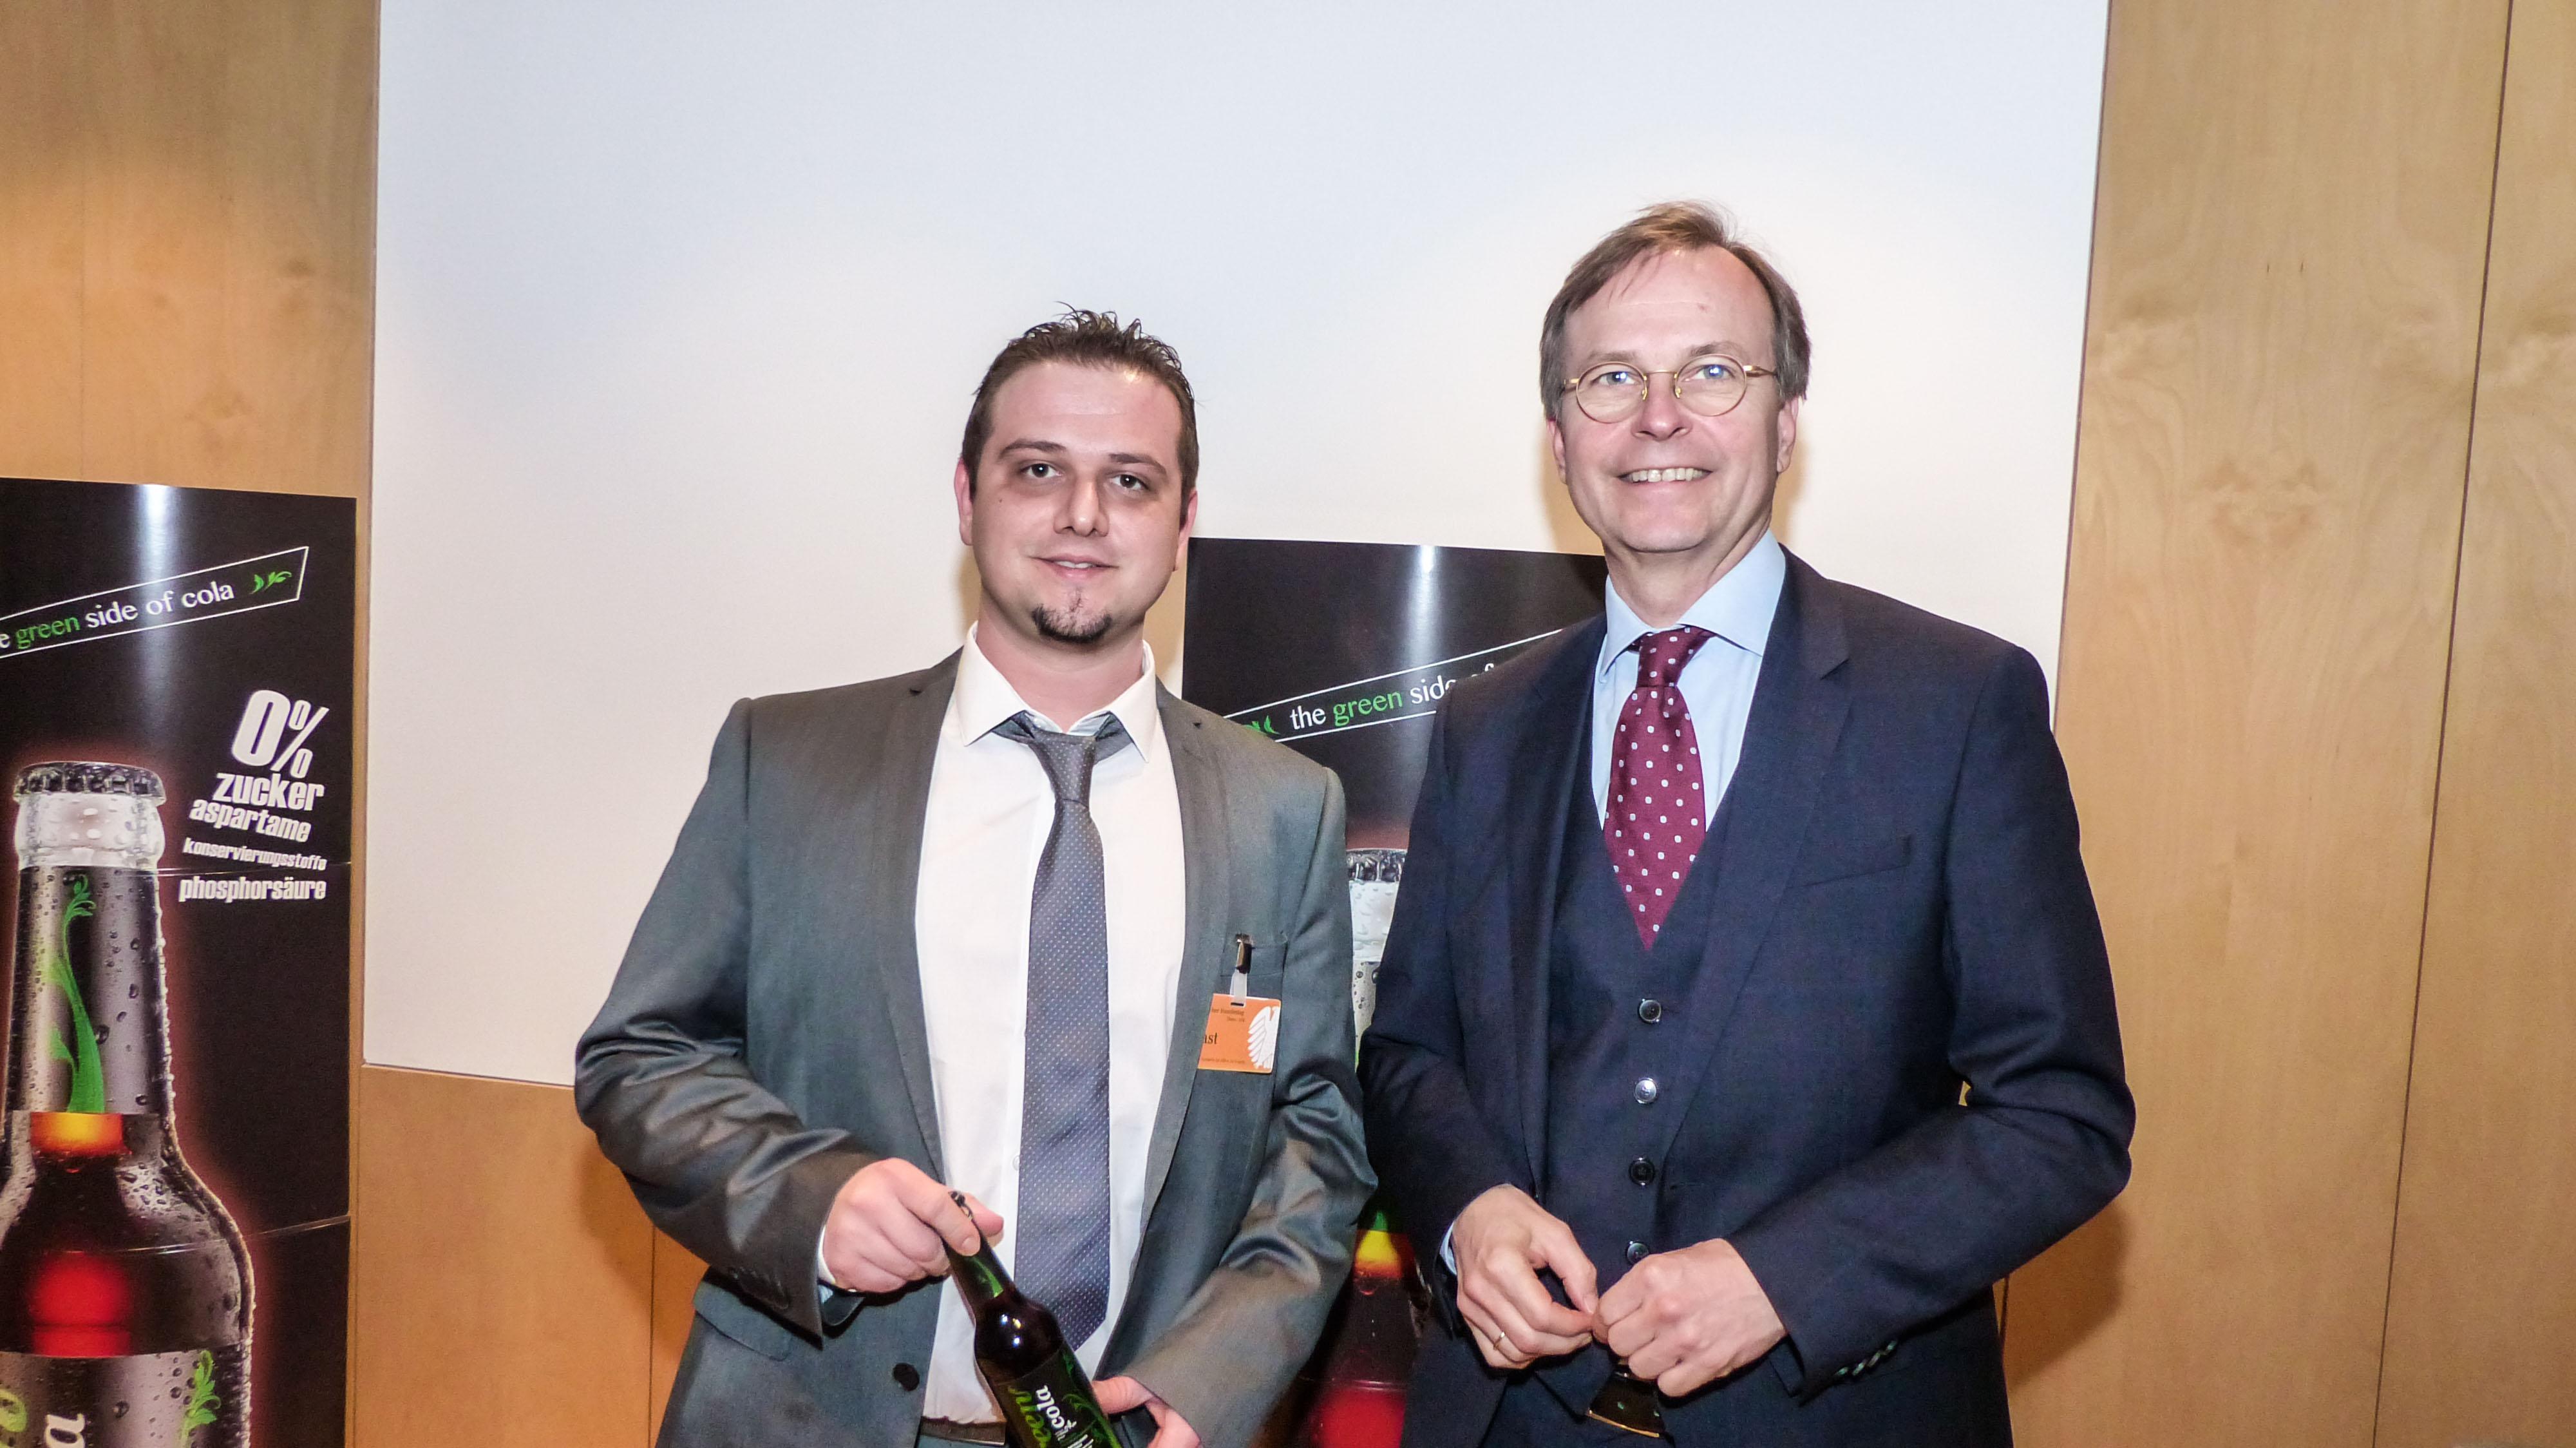 Green Cola: Το ελληνικό προϊόν που έκλεψε τις εντυπώσεις στο Γερμανικό Κοινοβούλιο